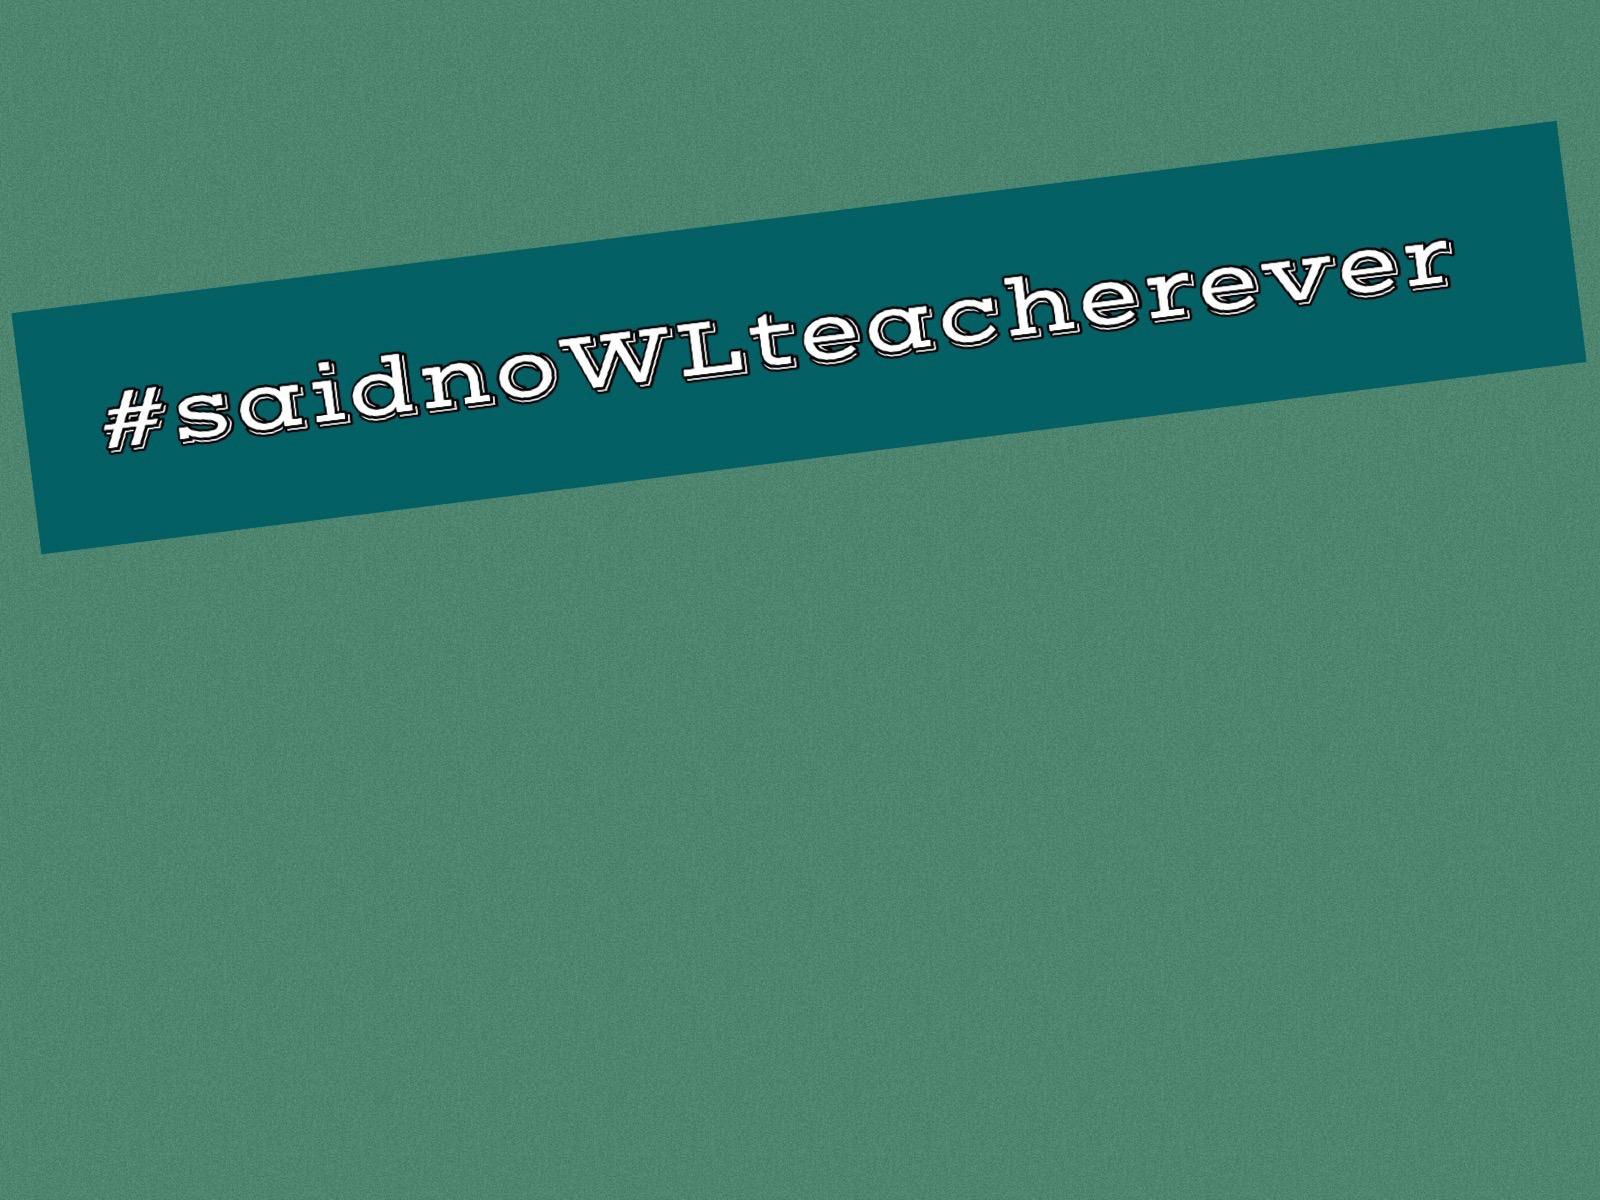 #saidnoWLteacherever